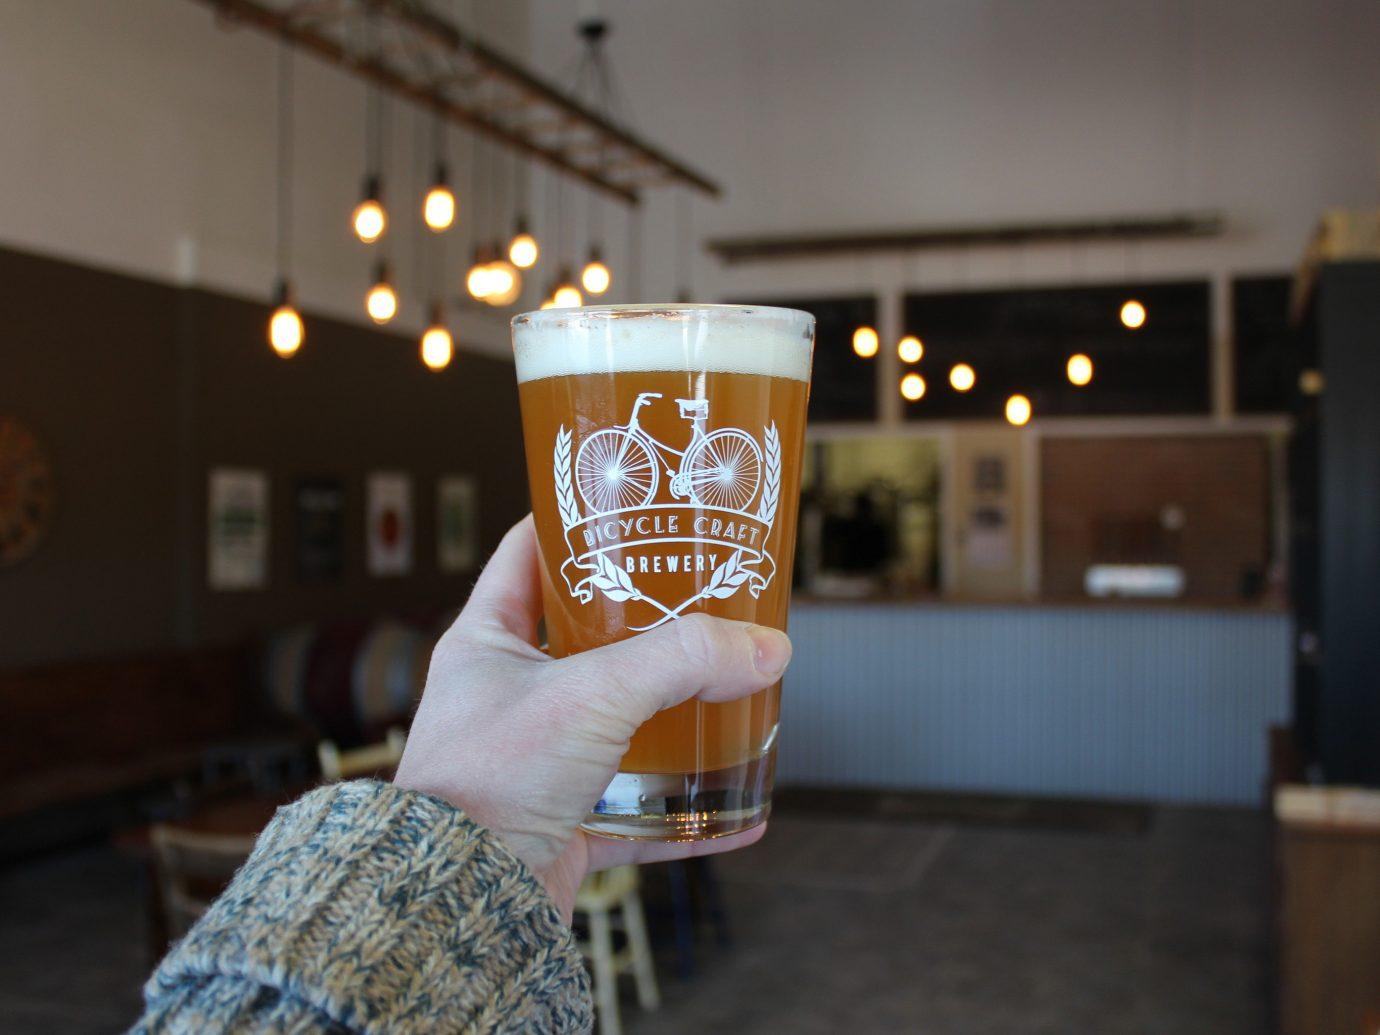 Food + Drink indoor cup wall person restaurant meal Drink sense beer Bar